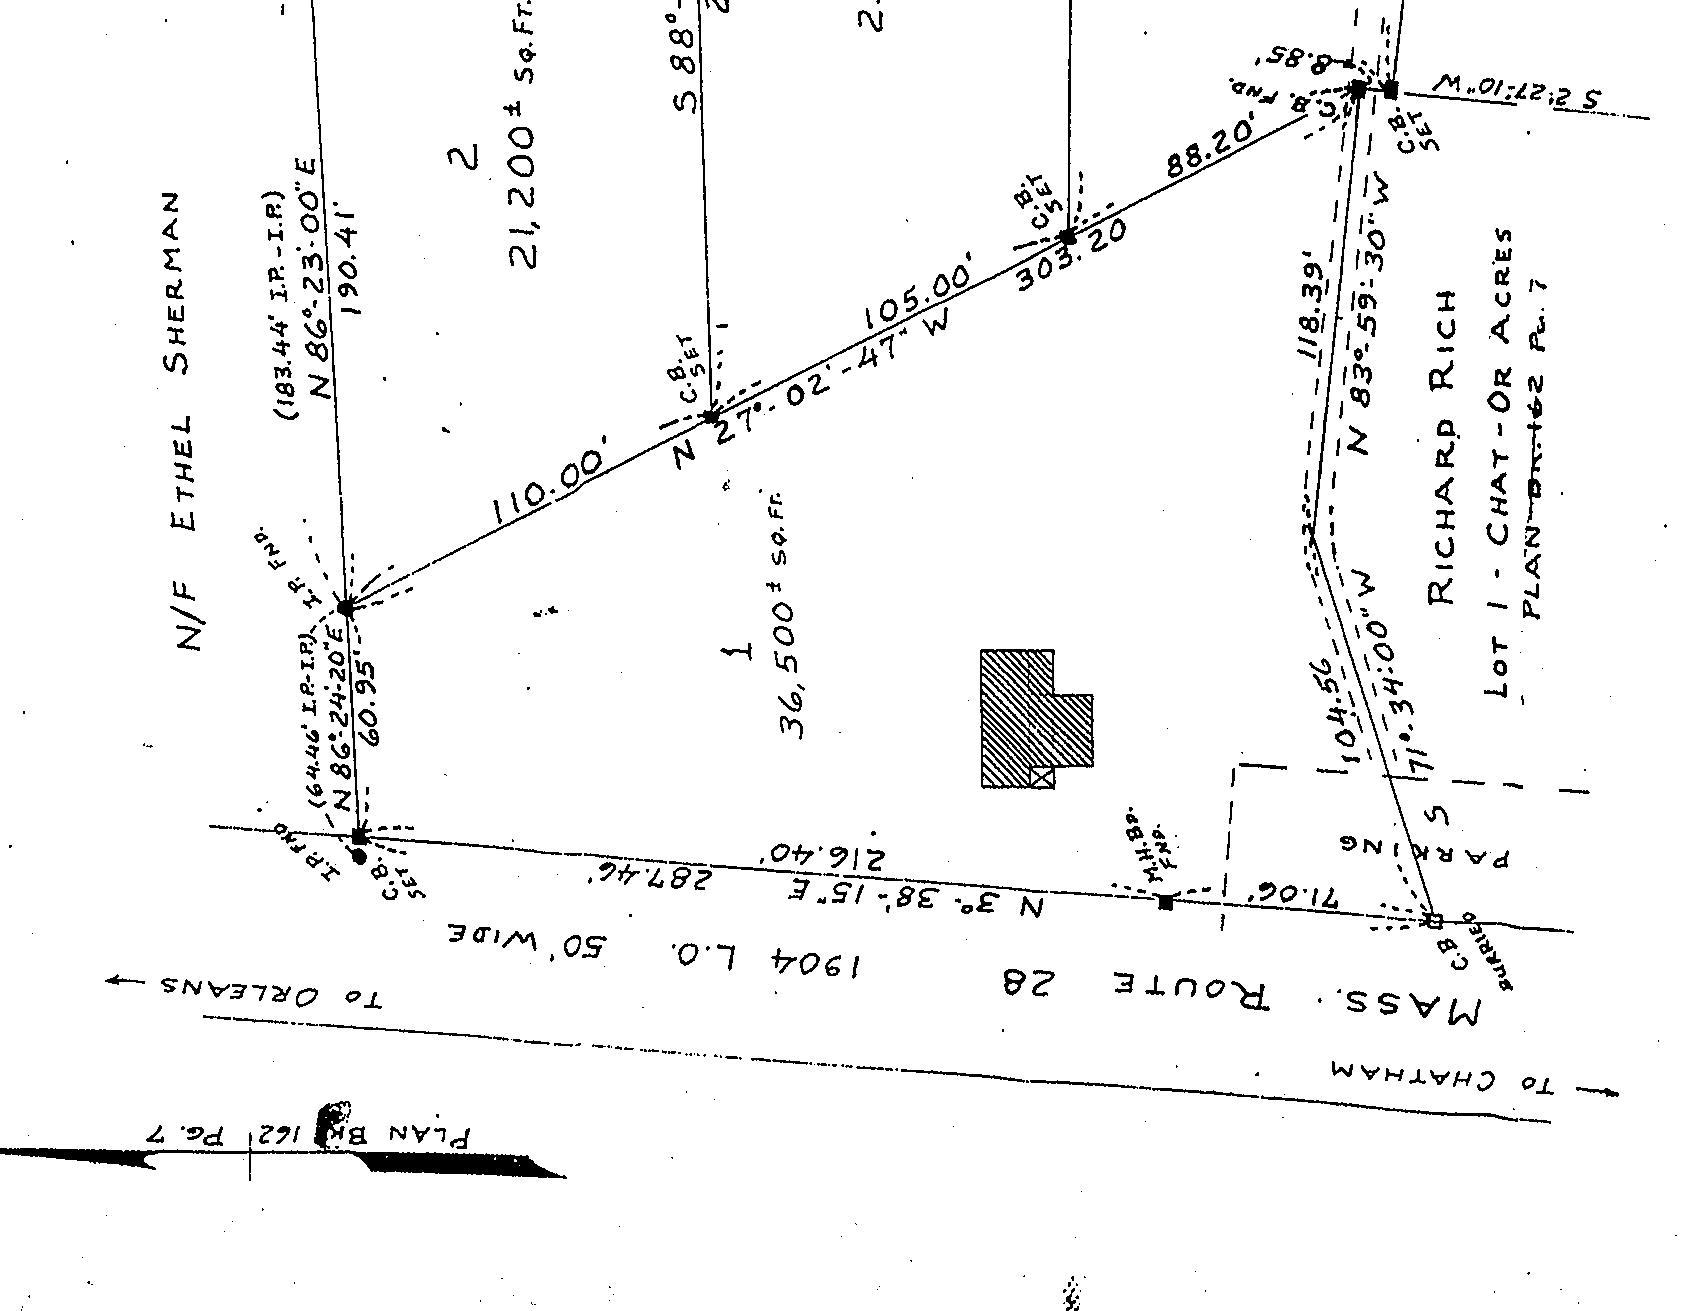 439 S Orleans Road, Orleans MA, 02653 details